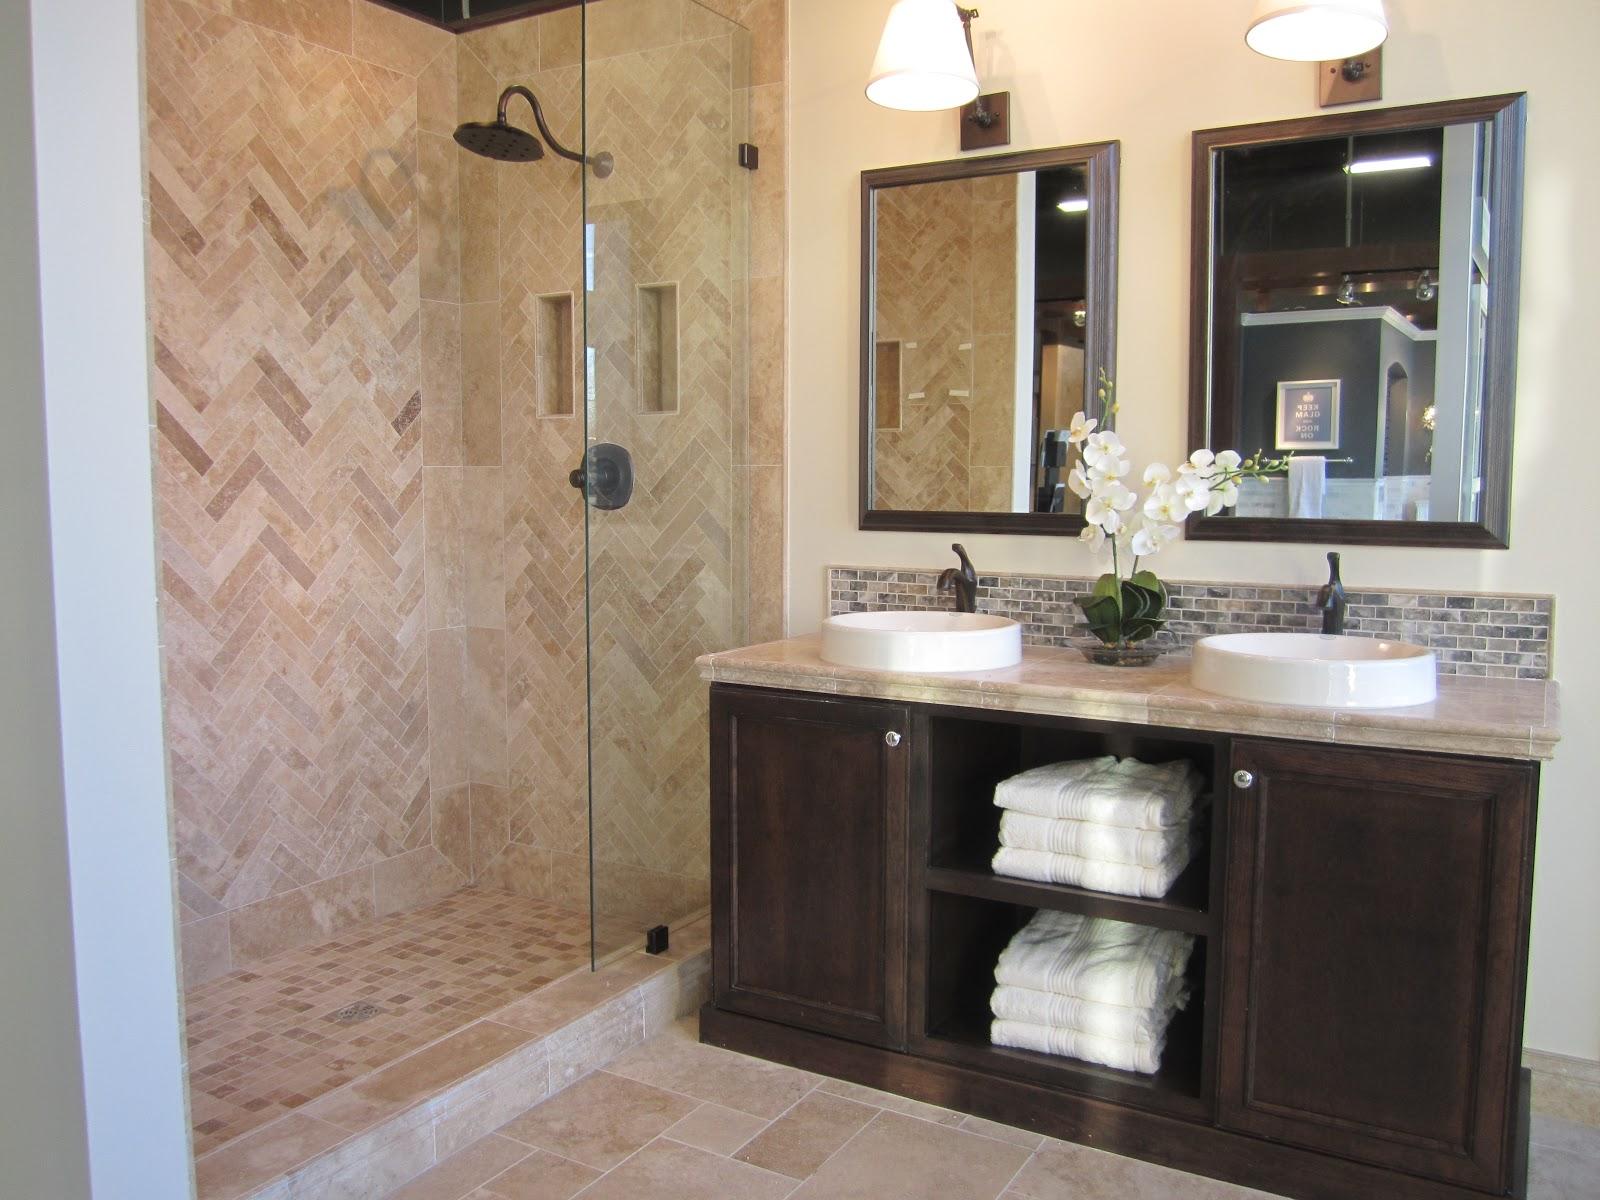 Bathroom Vanities Edison Nj the tile shop: designkirsty: 1/20/13 - 1/27/13